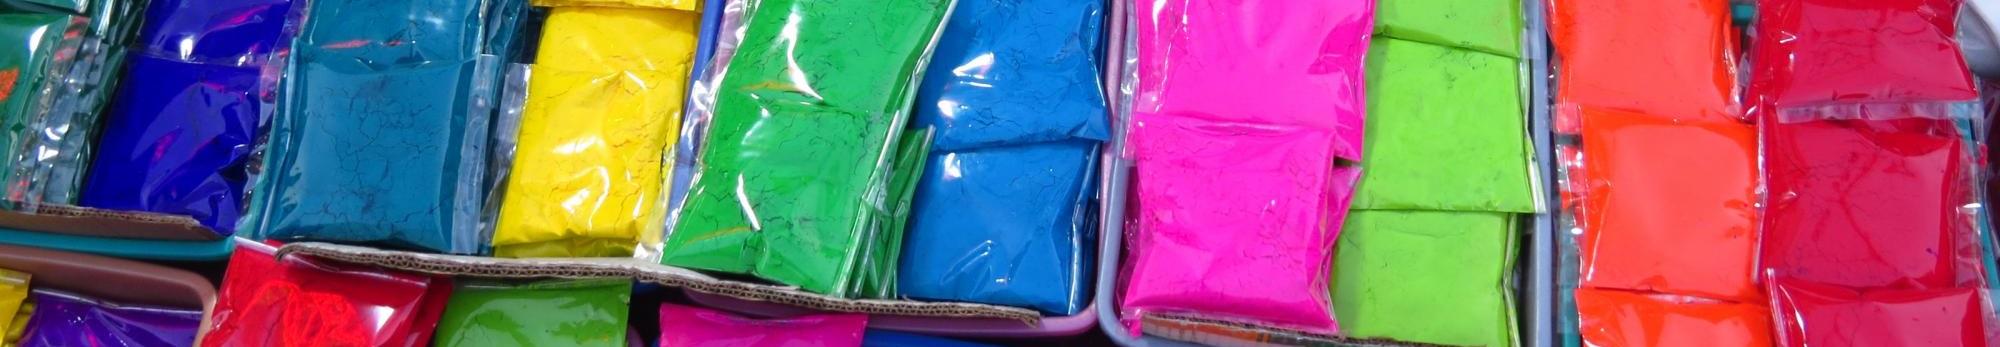 color-powder-holi-purchase-order